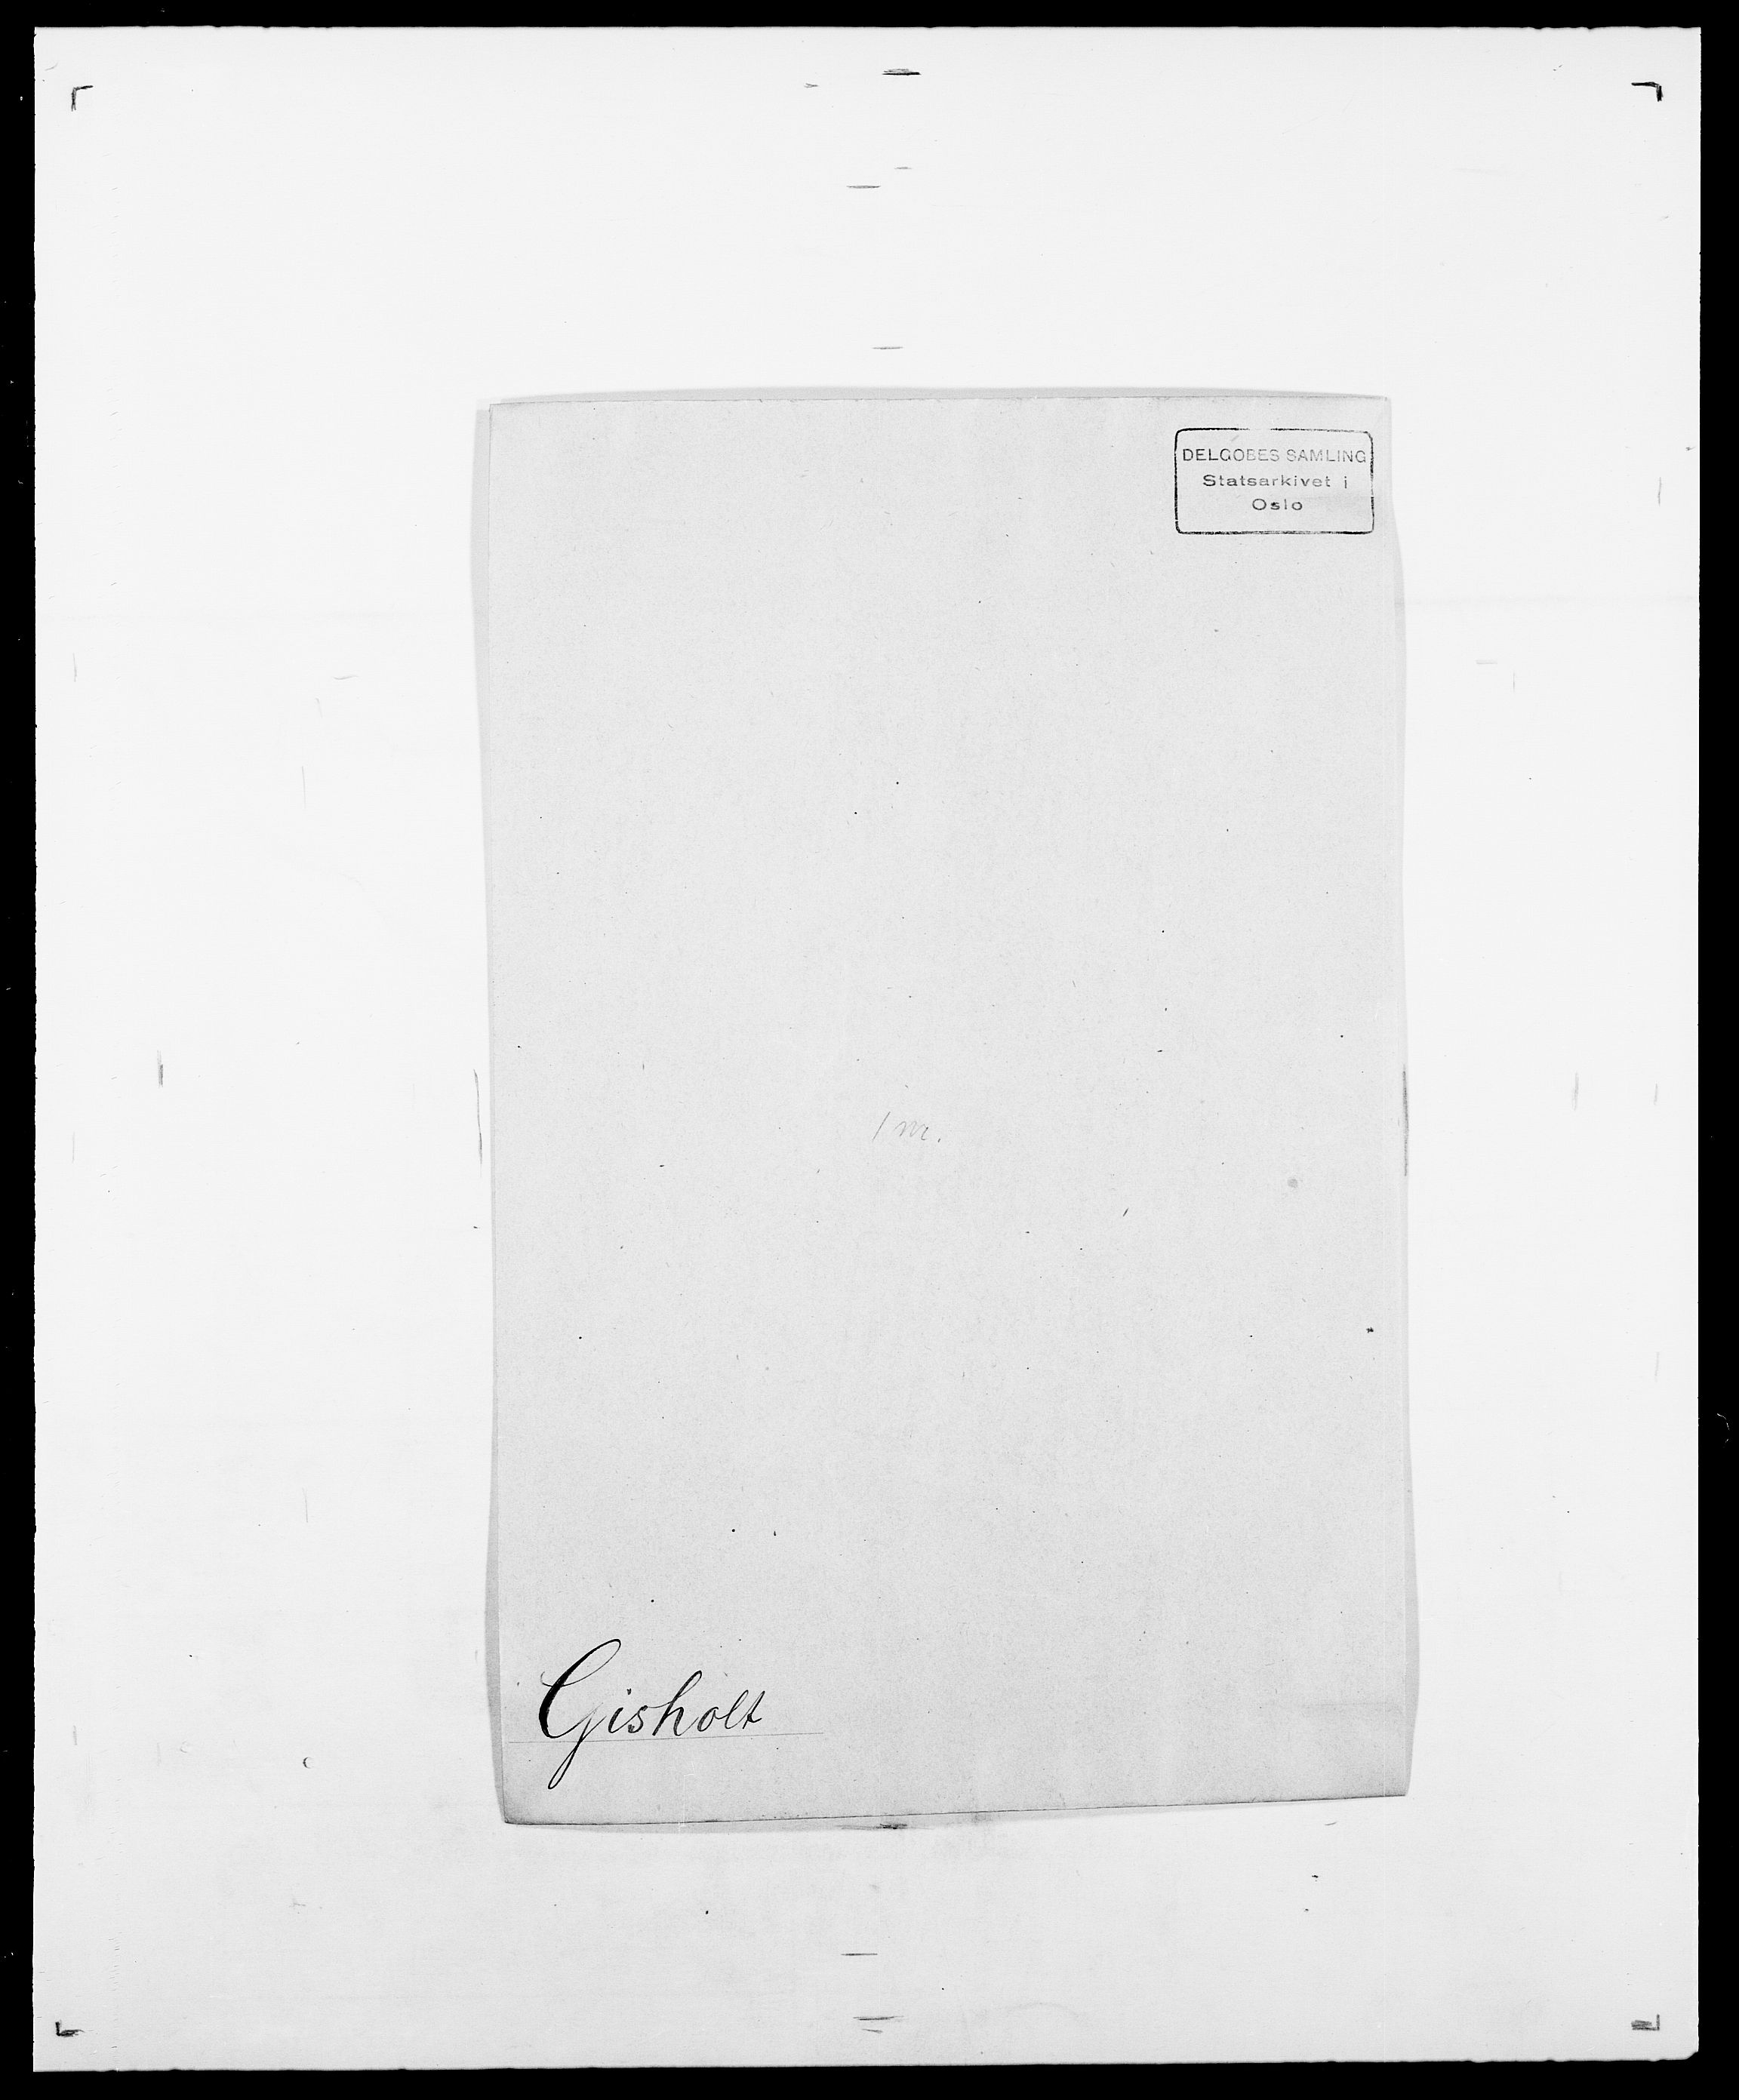 SAO, Delgobe, Charles Antoine - samling, D/Da/L0014: Giebdhausen - Grip, s. 44